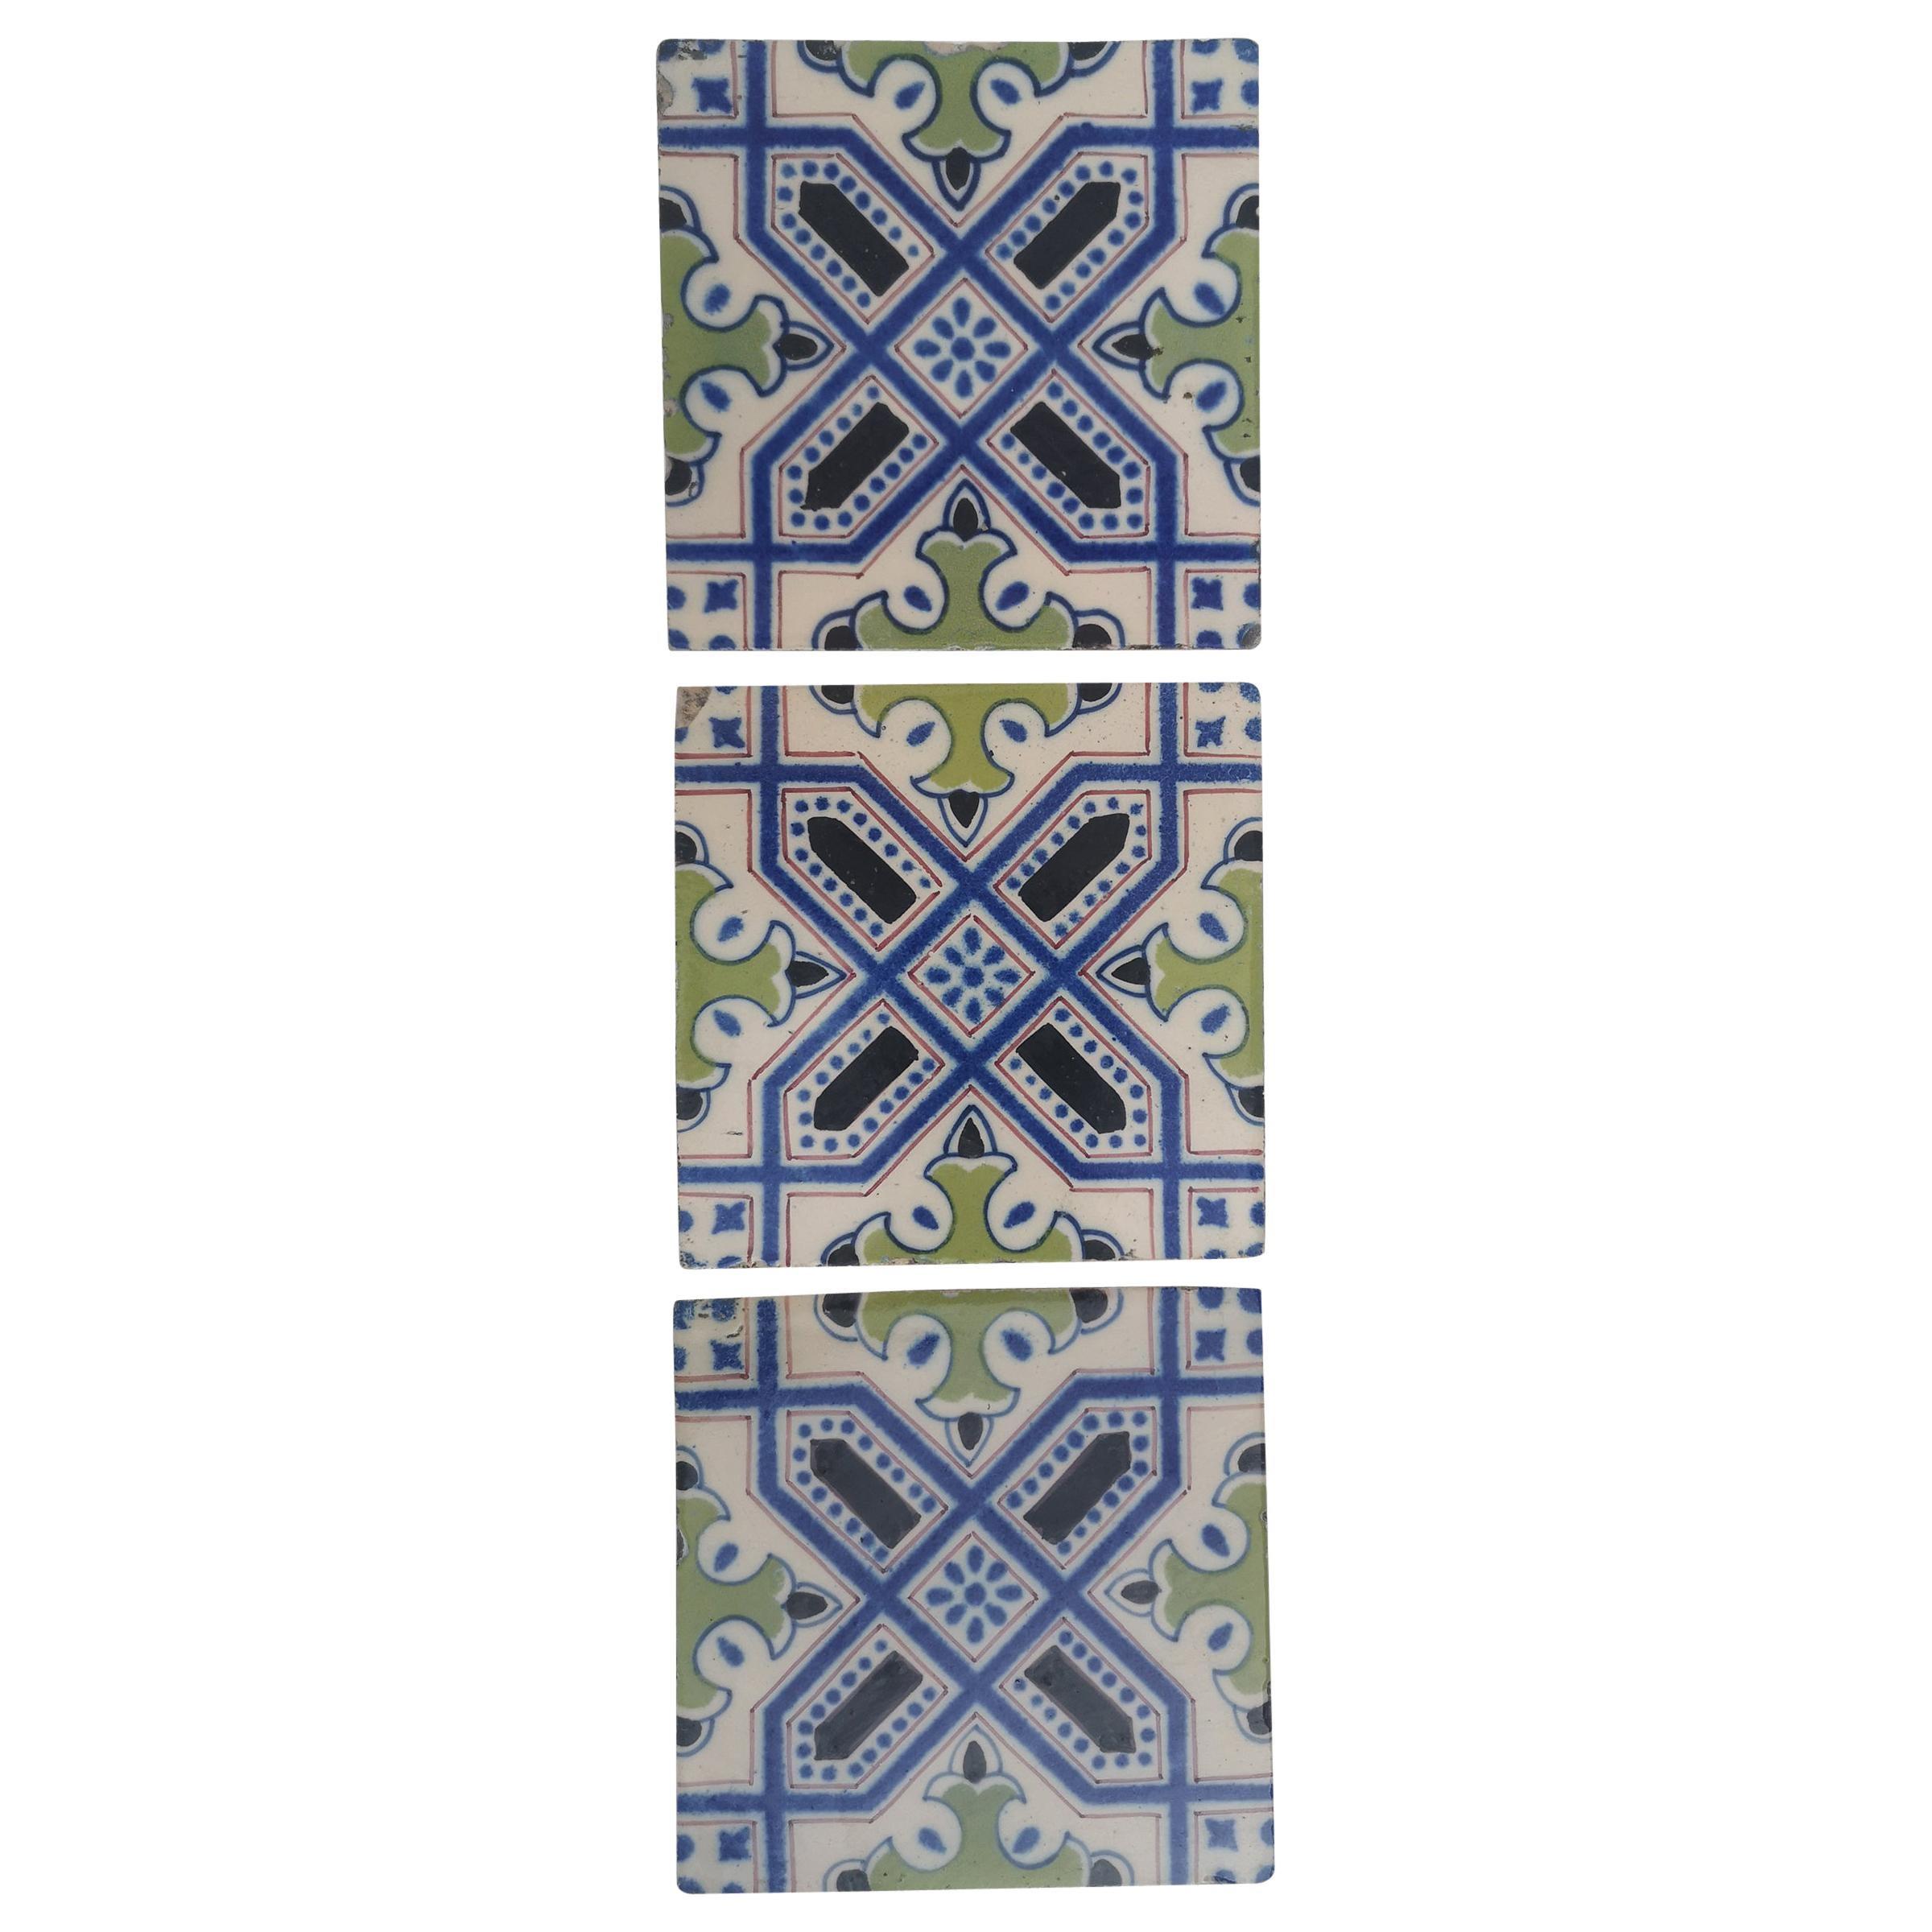 Set of 35 Handmade Antique Ceramic Tiles, Dutch, 1920s